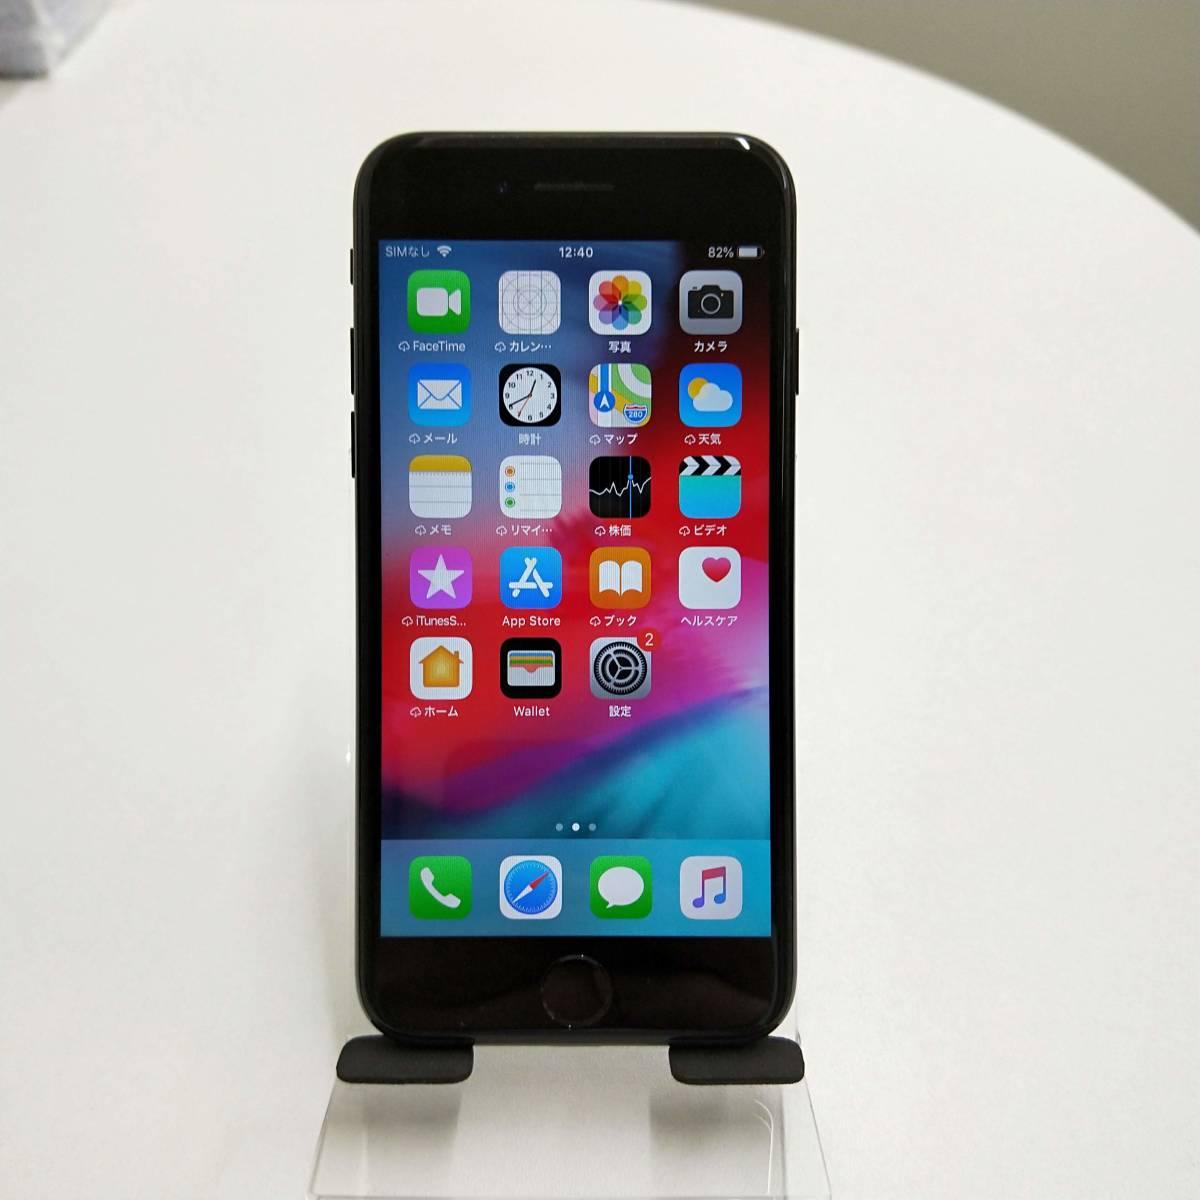 SIMフリー iPhone 7 128GB Jet Black 美品 バッテリー85% <本体のみ> #051